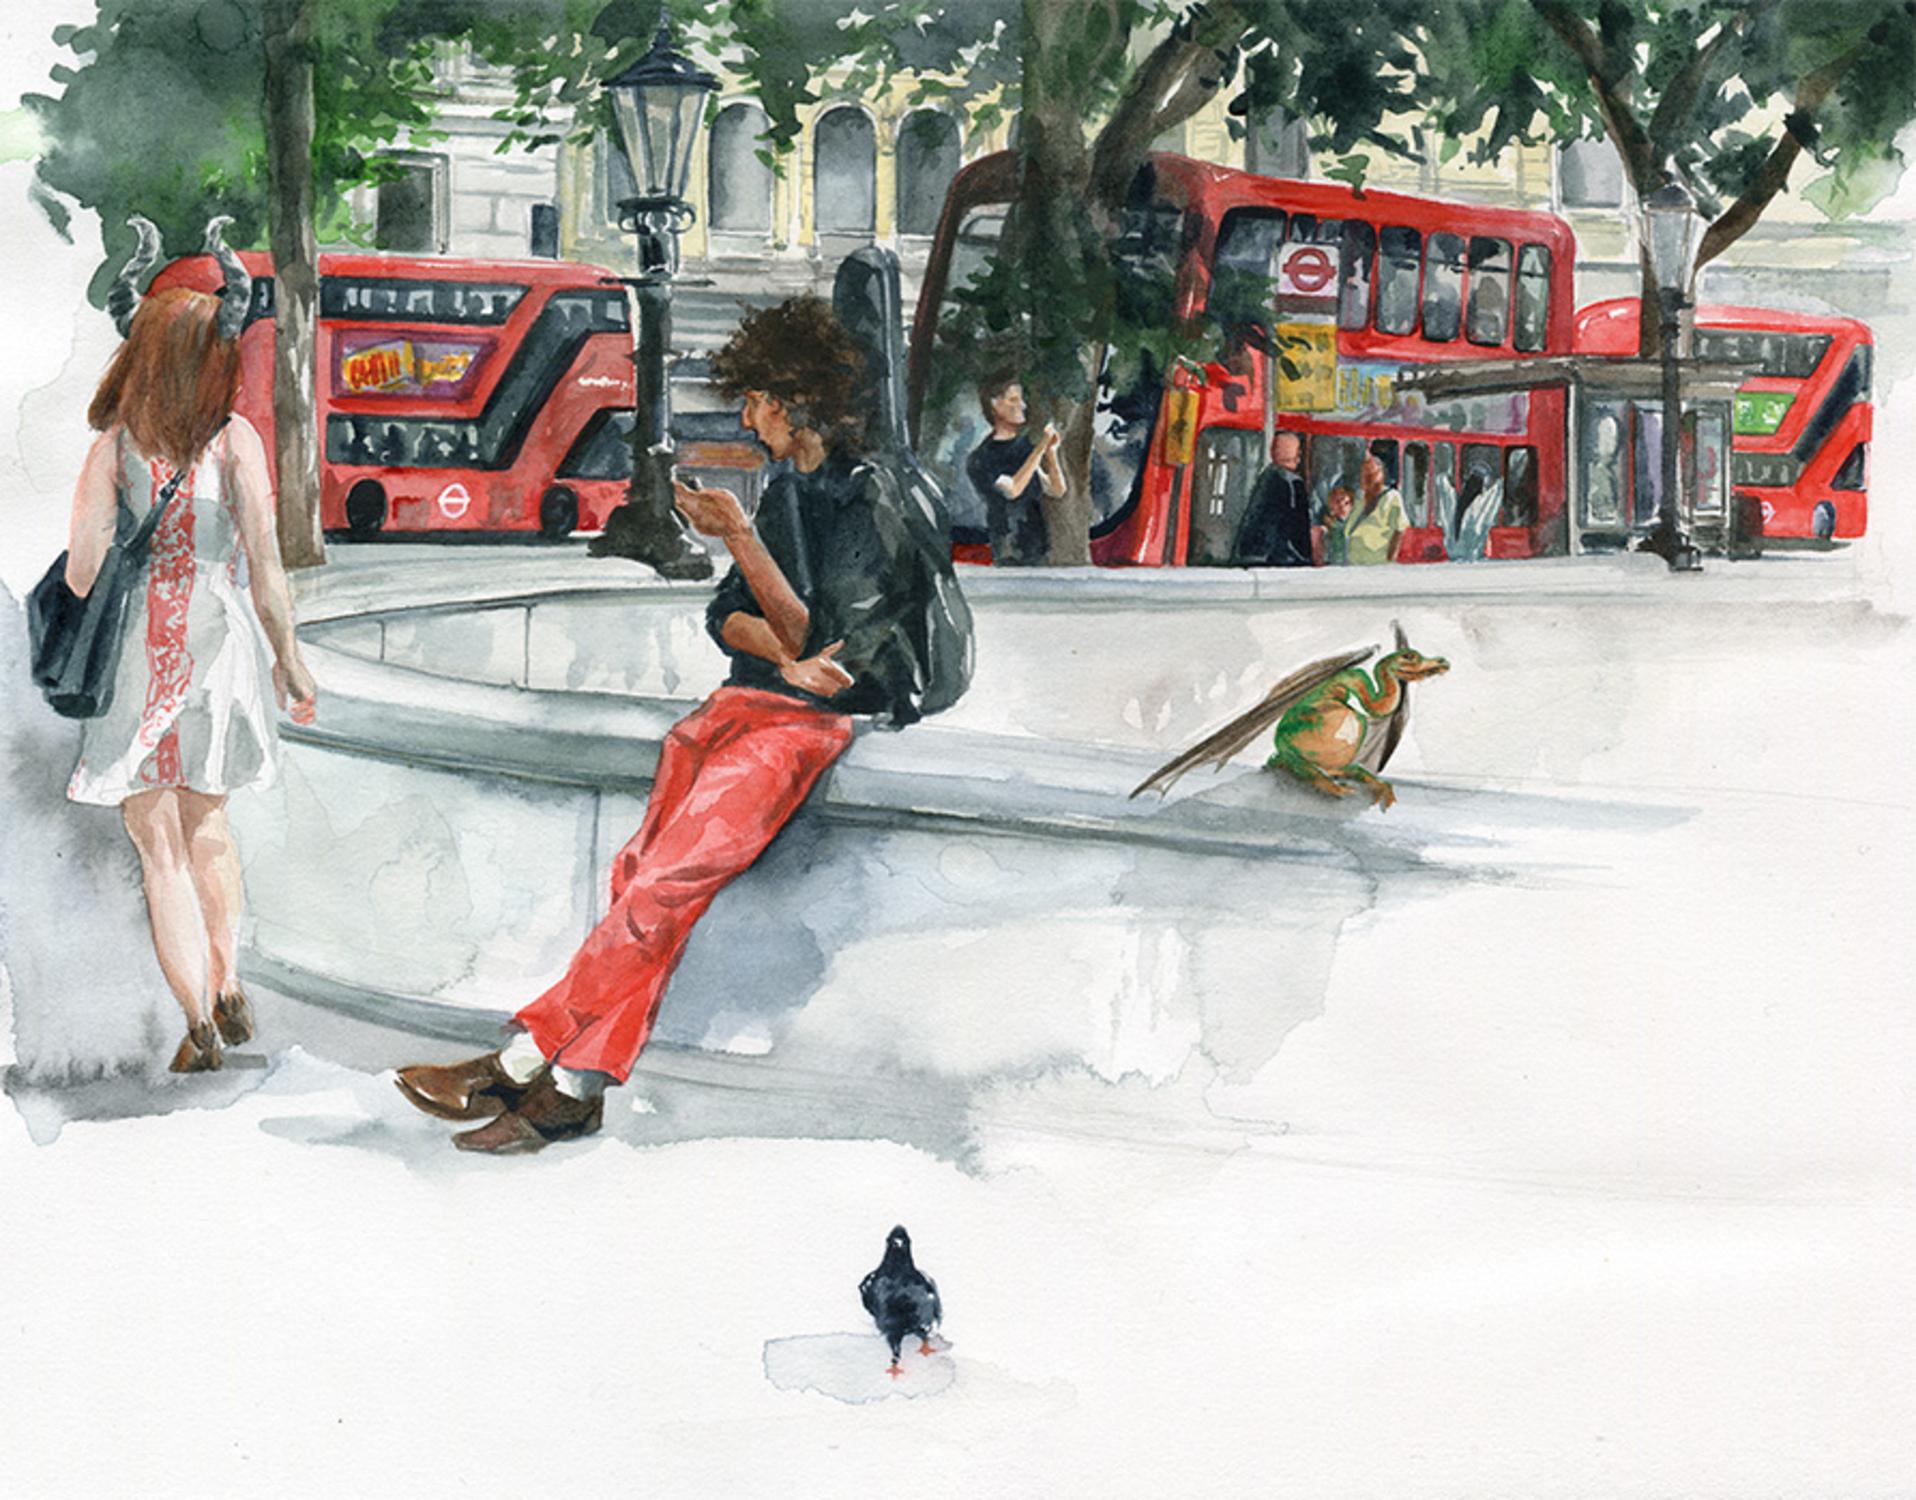 Edge of Trafalgar Square Artwork by Clare Henry McCanna